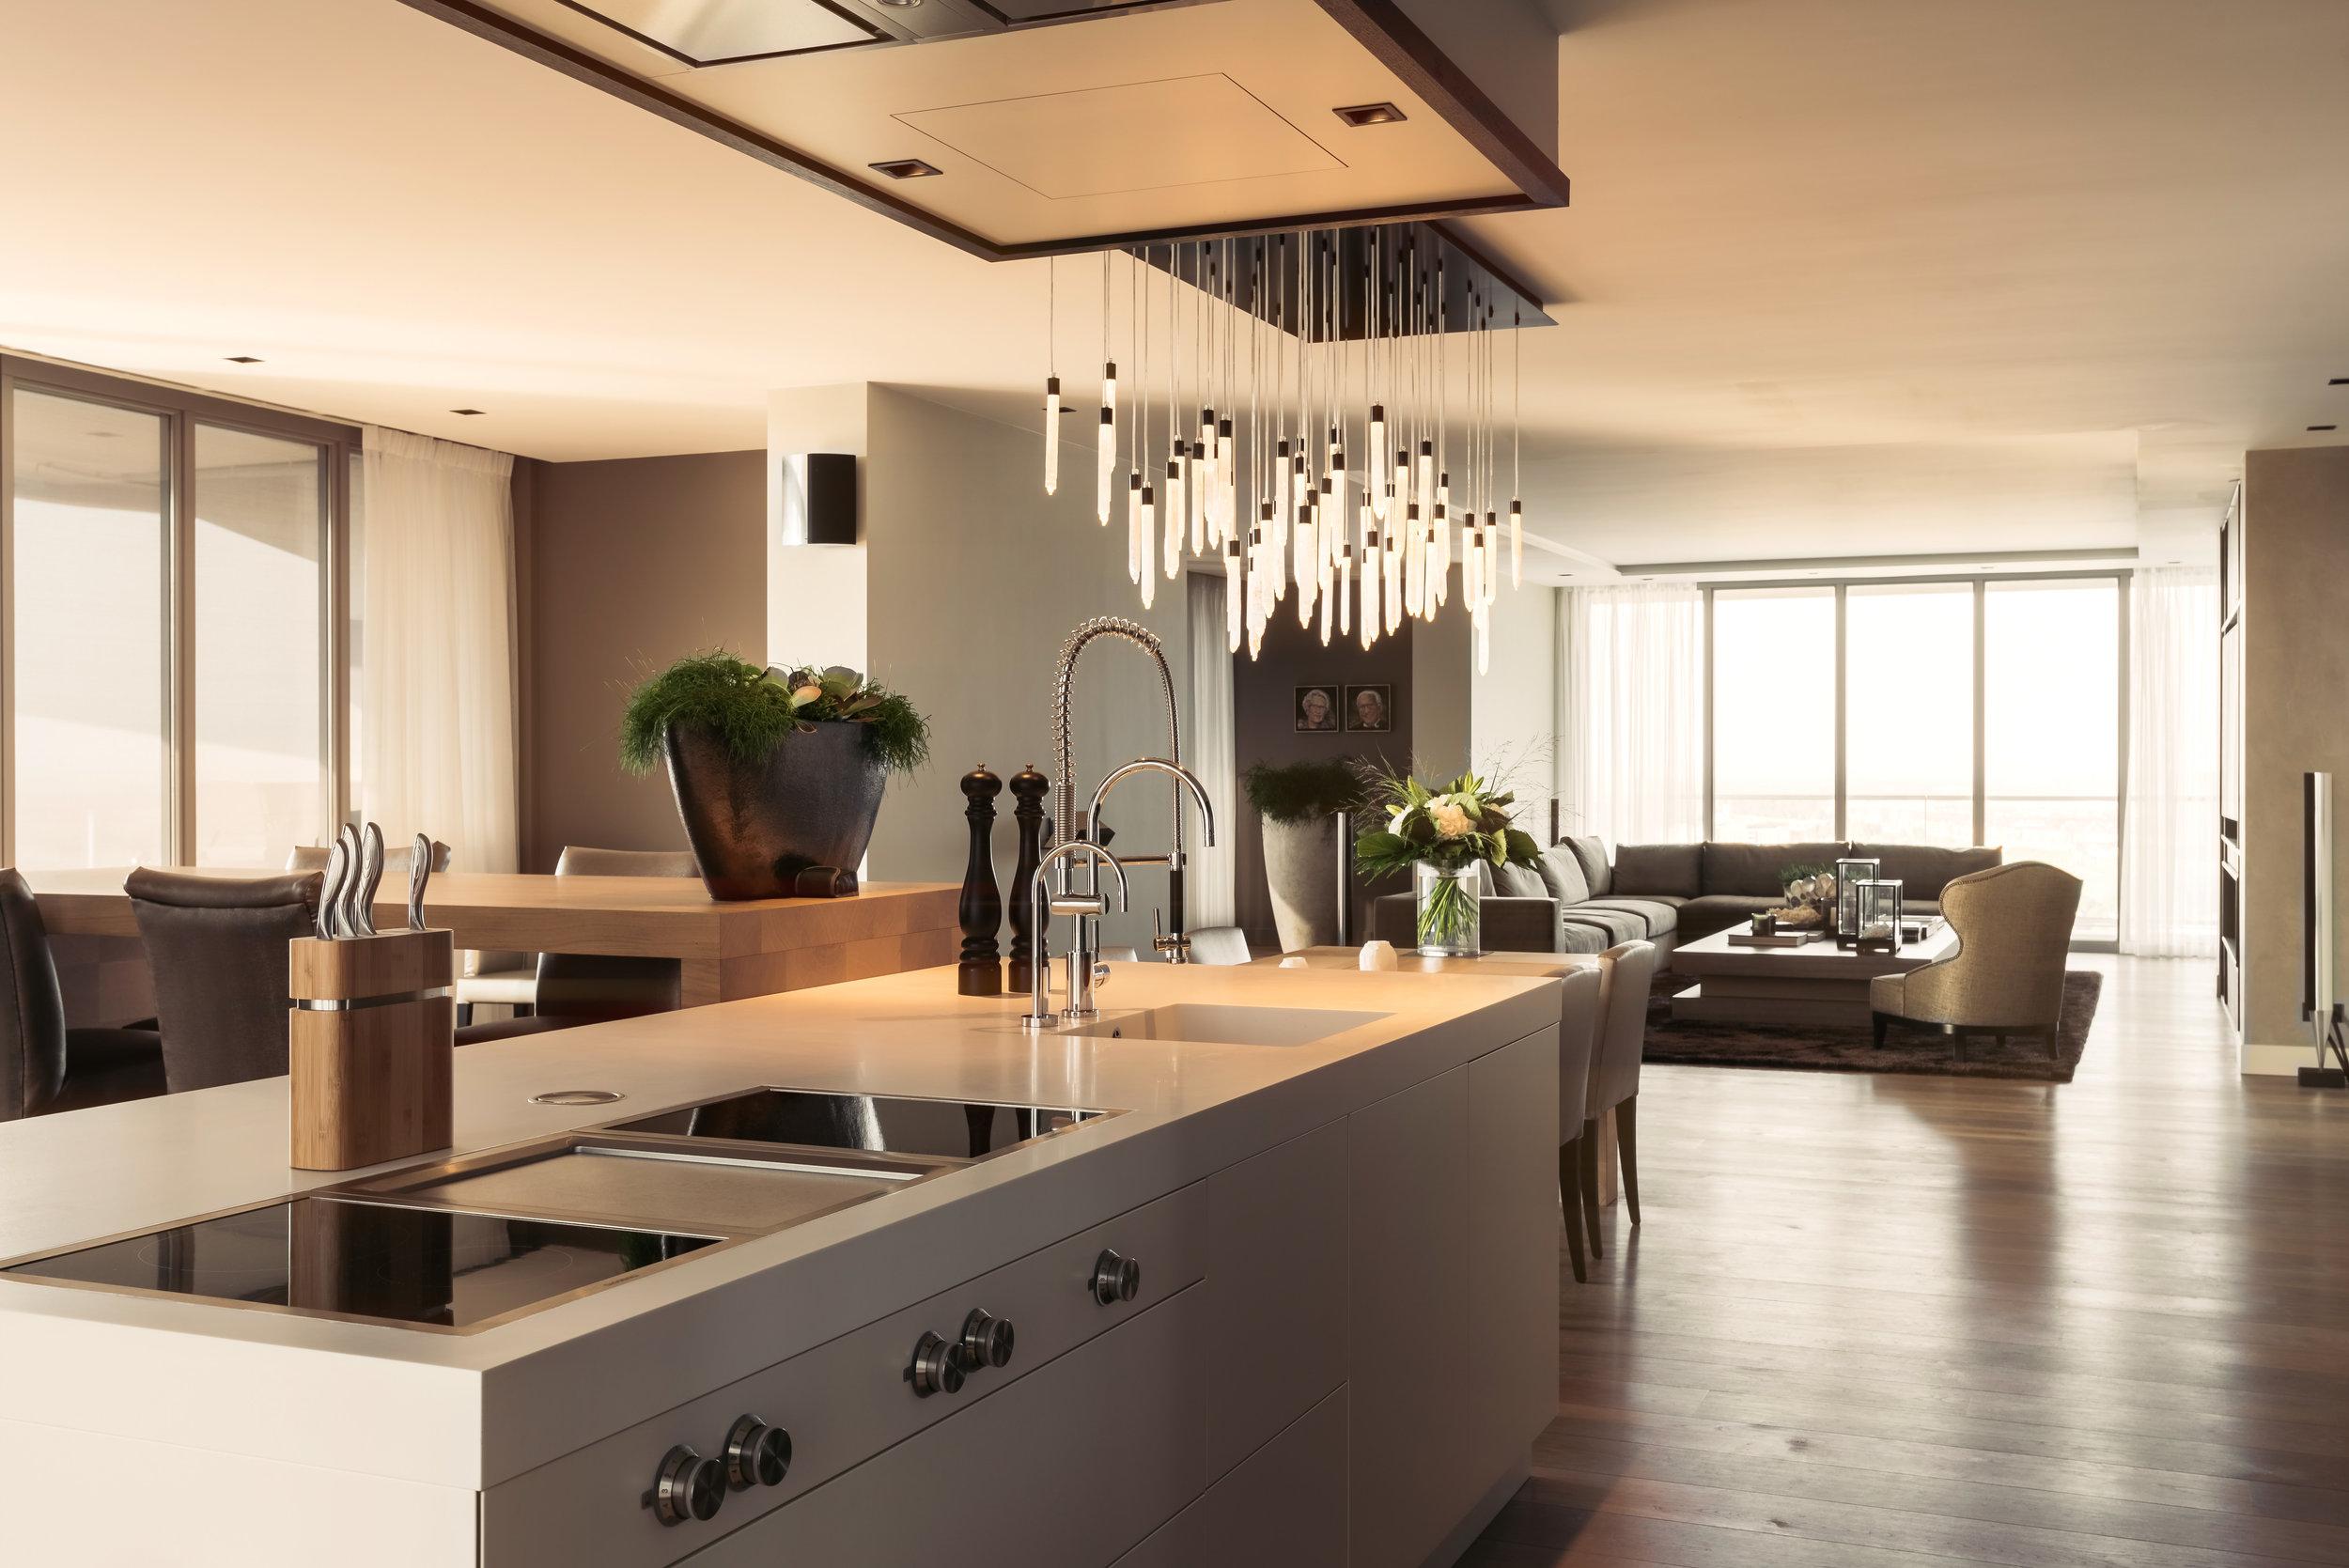 Iljahuner-CMI-Penthouse-19.jpg